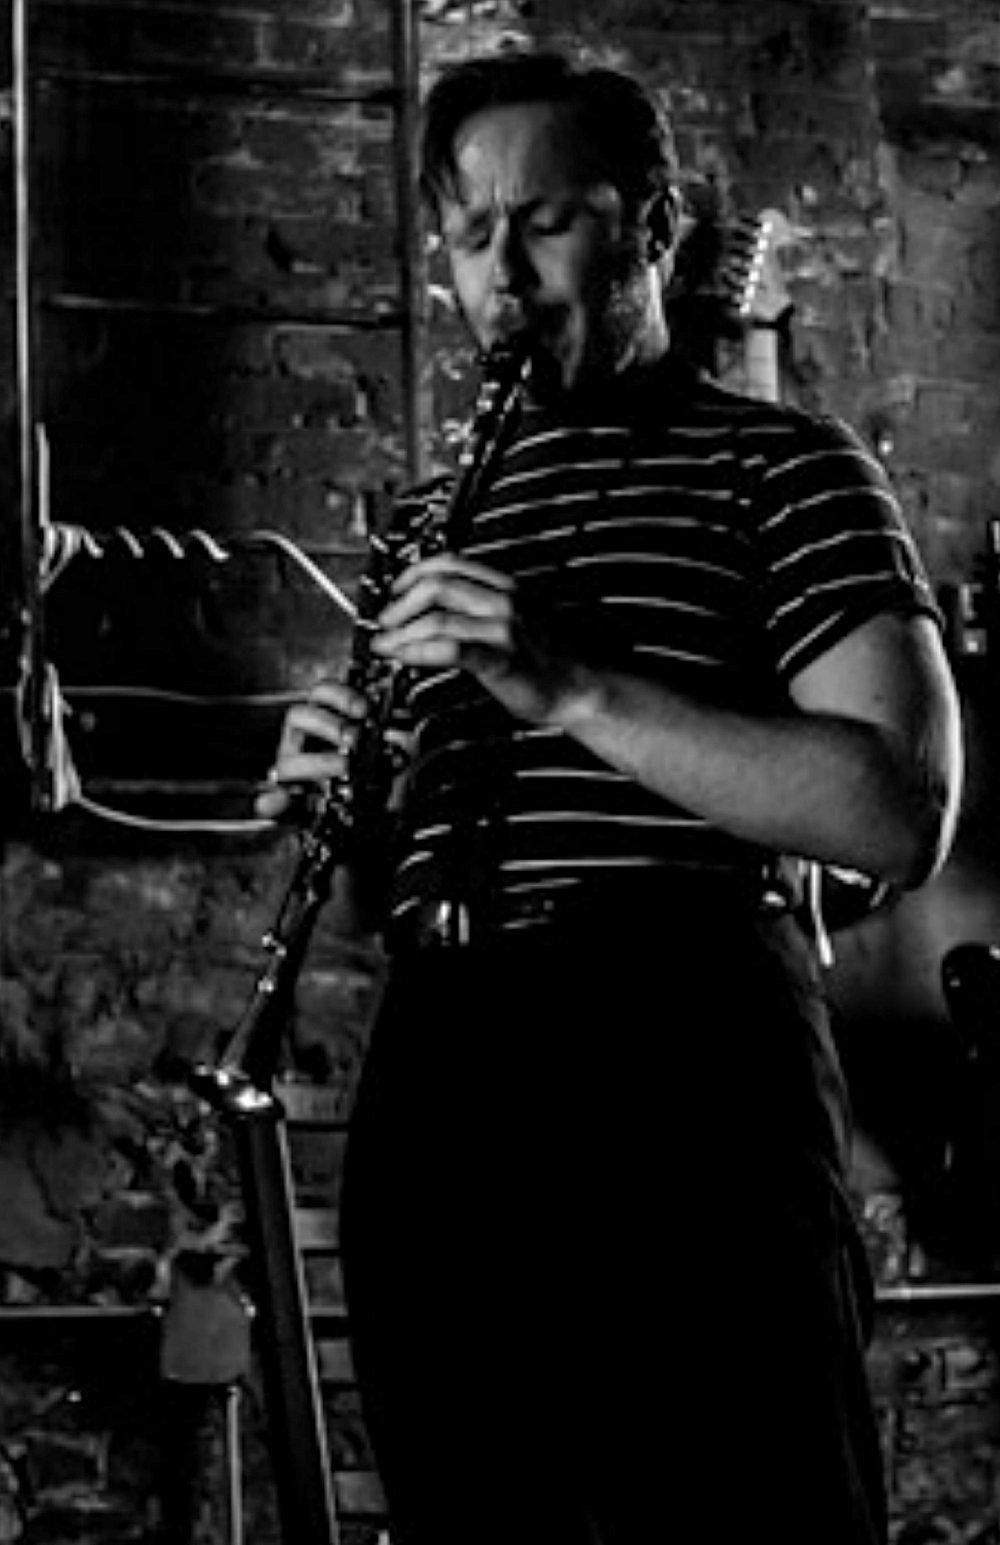 Stan Zenkoff - clarinet & saxophone  image: Peter Gannushkin